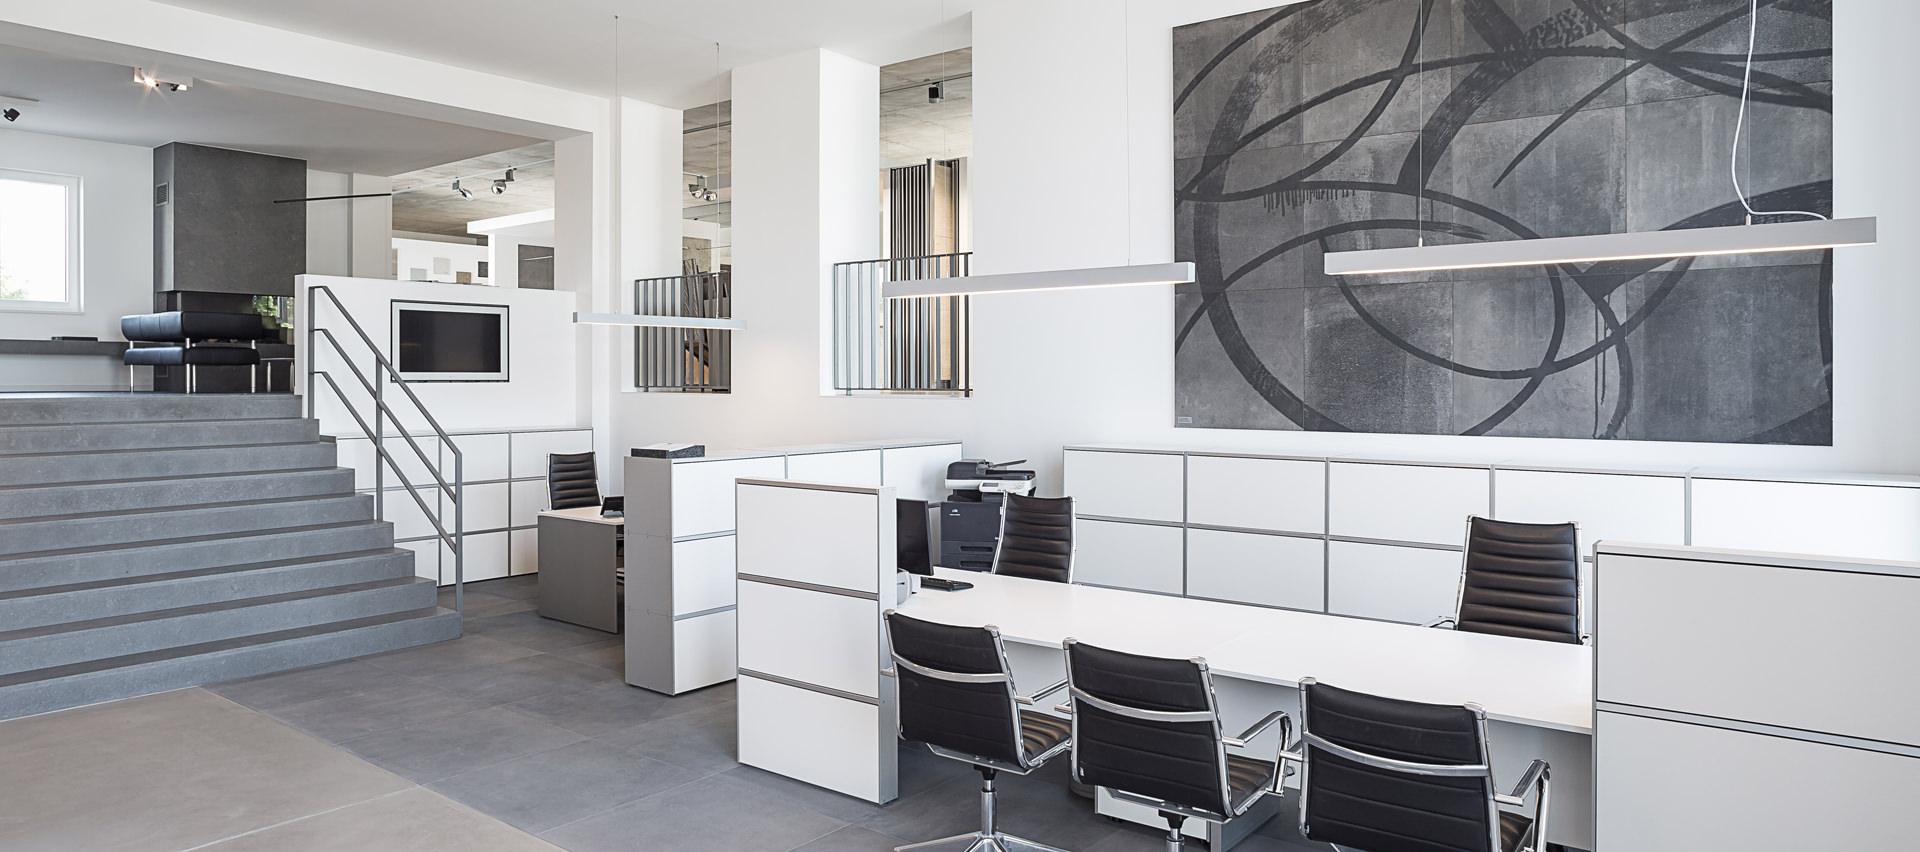 badausstellung d sseldorf home arnolds b der gmbh badausstellung in d sseldorf besuchen sie. Black Bedroom Furniture Sets. Home Design Ideas